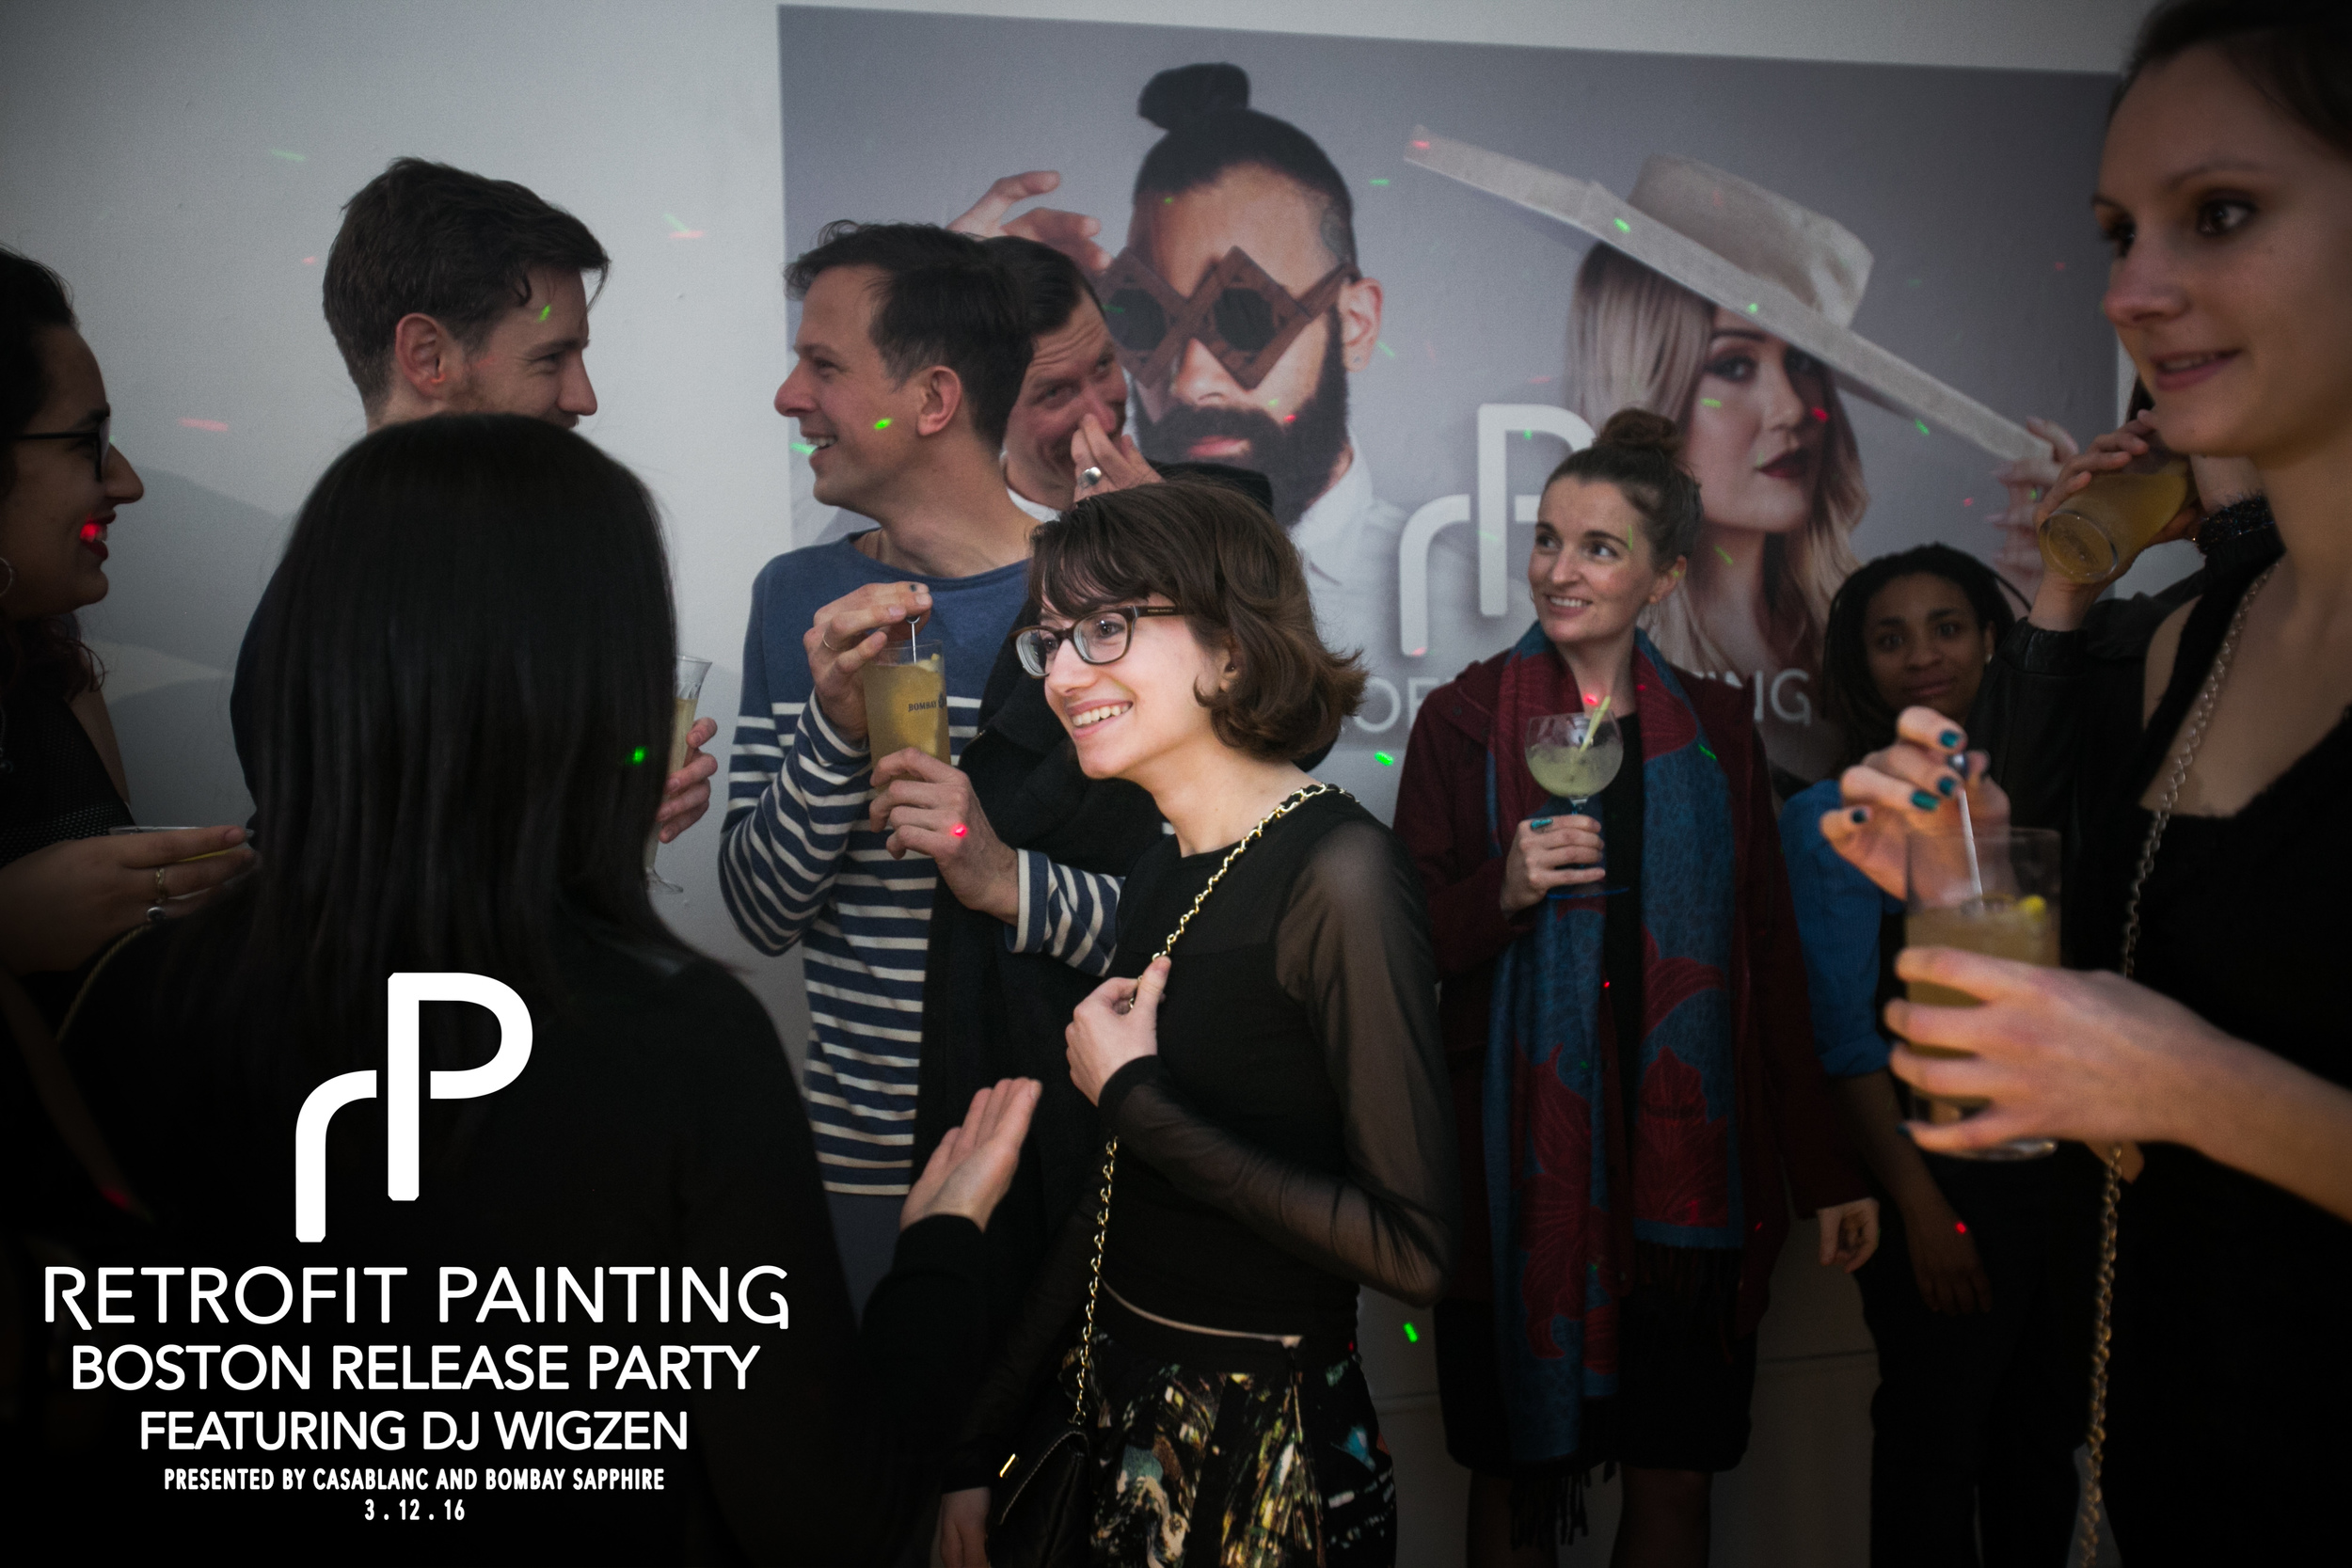 Retrofit Painting Boston Release Party 0165.jpg